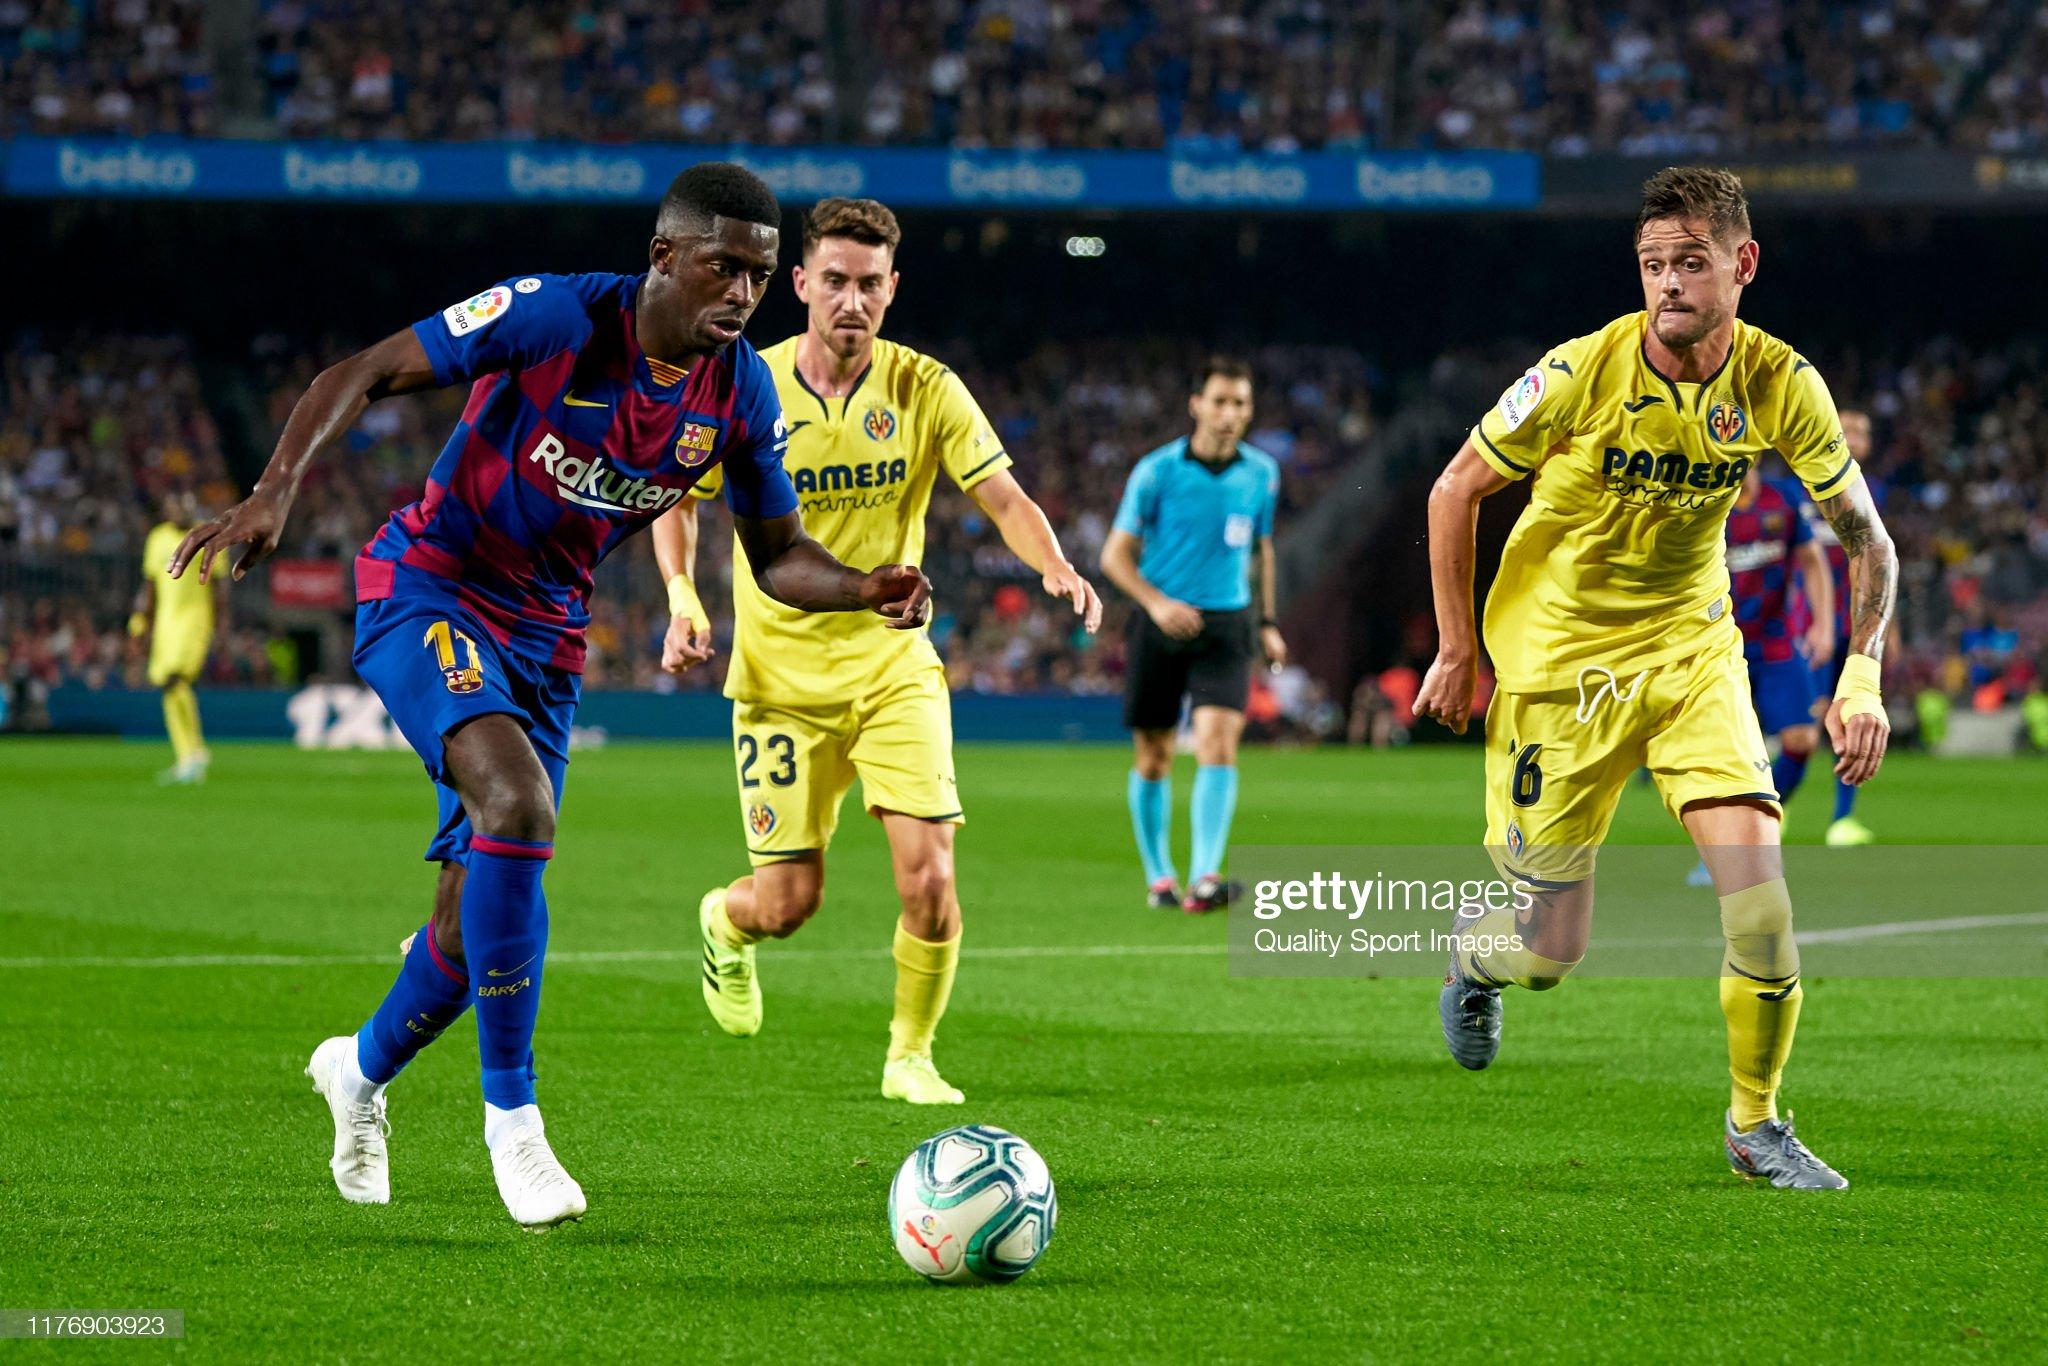 صور مباراة : برشلونة - فياريال 2-1 ( 24-09-2019 )  Ousmane-dembele-of-fc-barcelona-competes-for-the-ball-with-funes-mori-picture-id1176903923?s=2048x2048